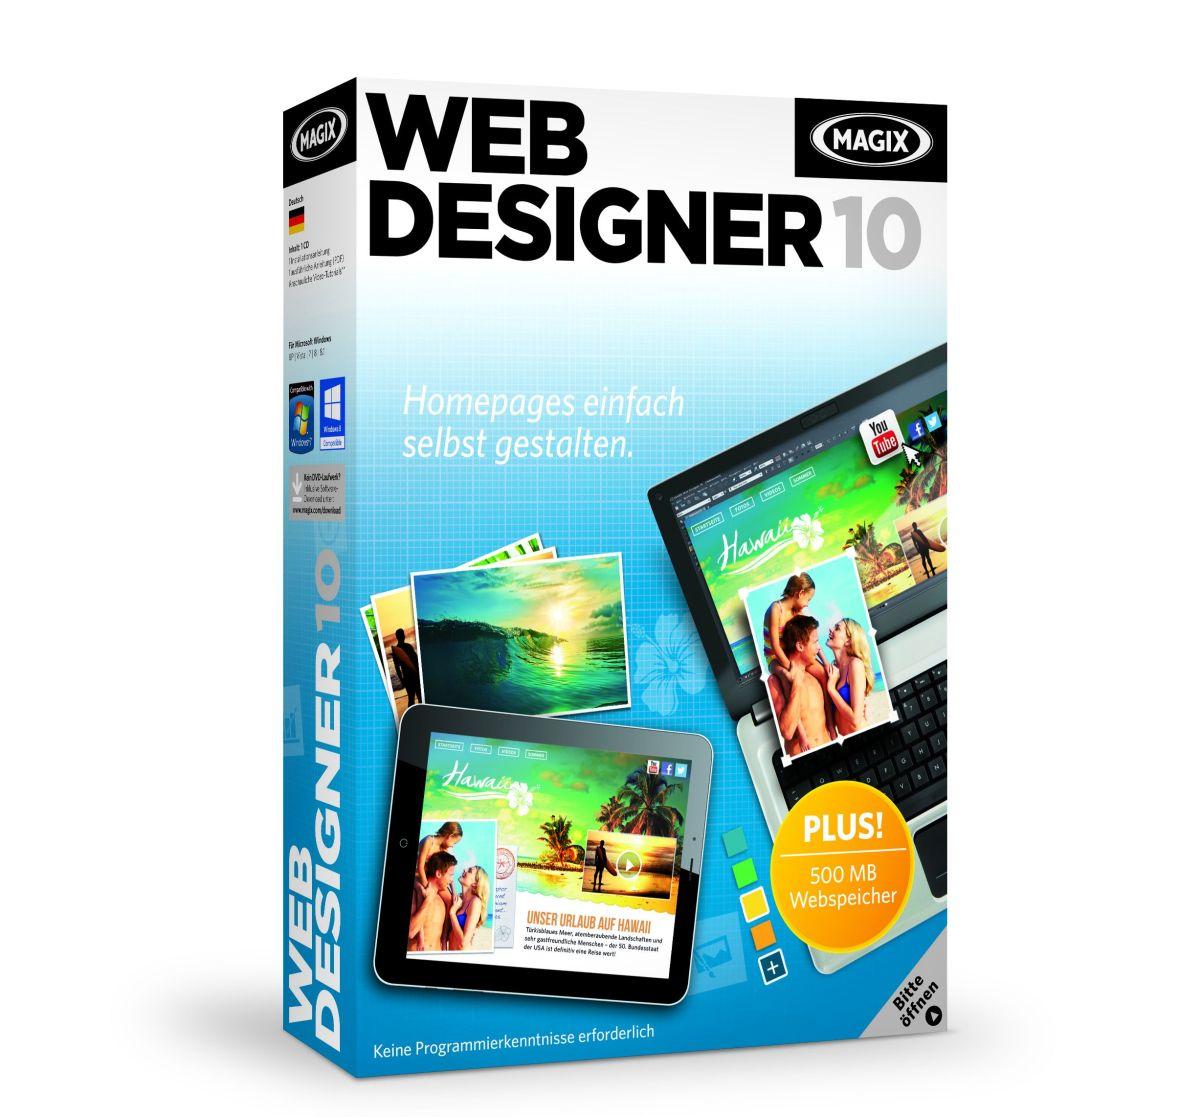 Magix Web Designer 10